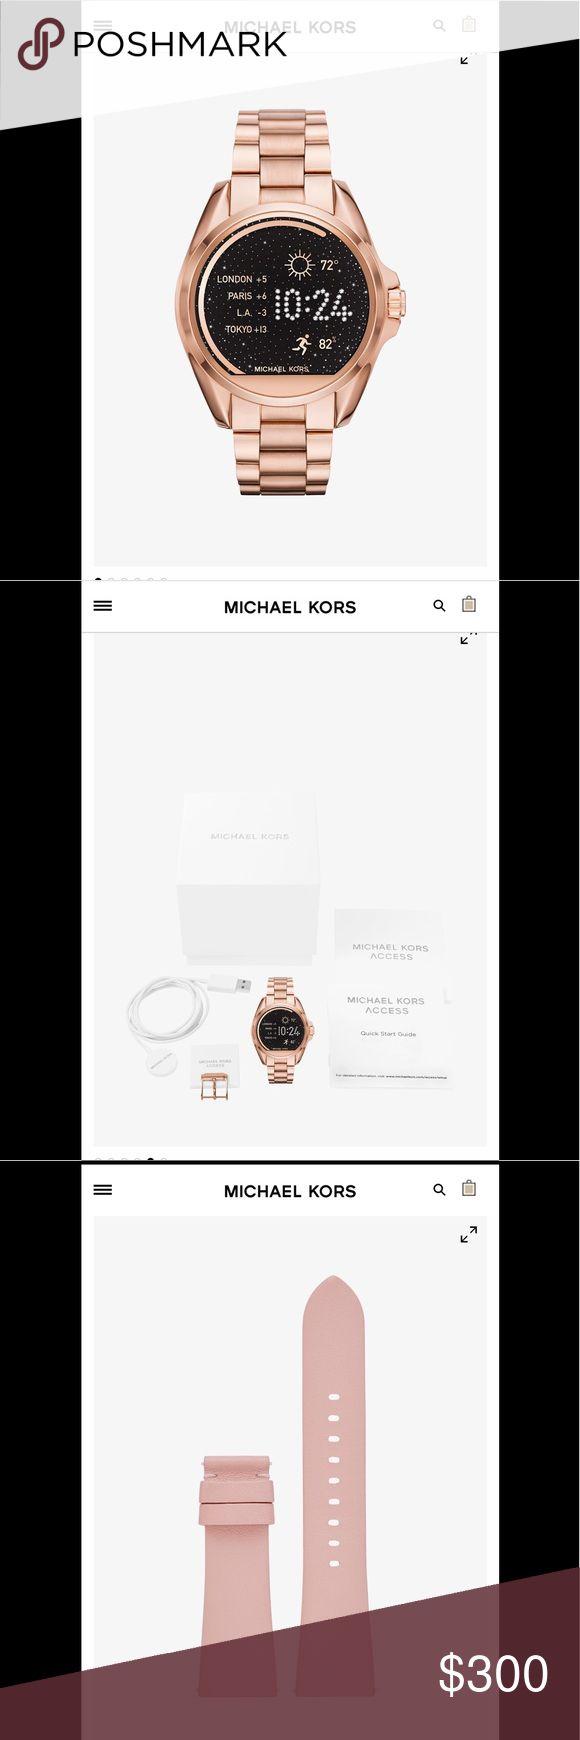 Michael kors rose gold smartwatch nwt